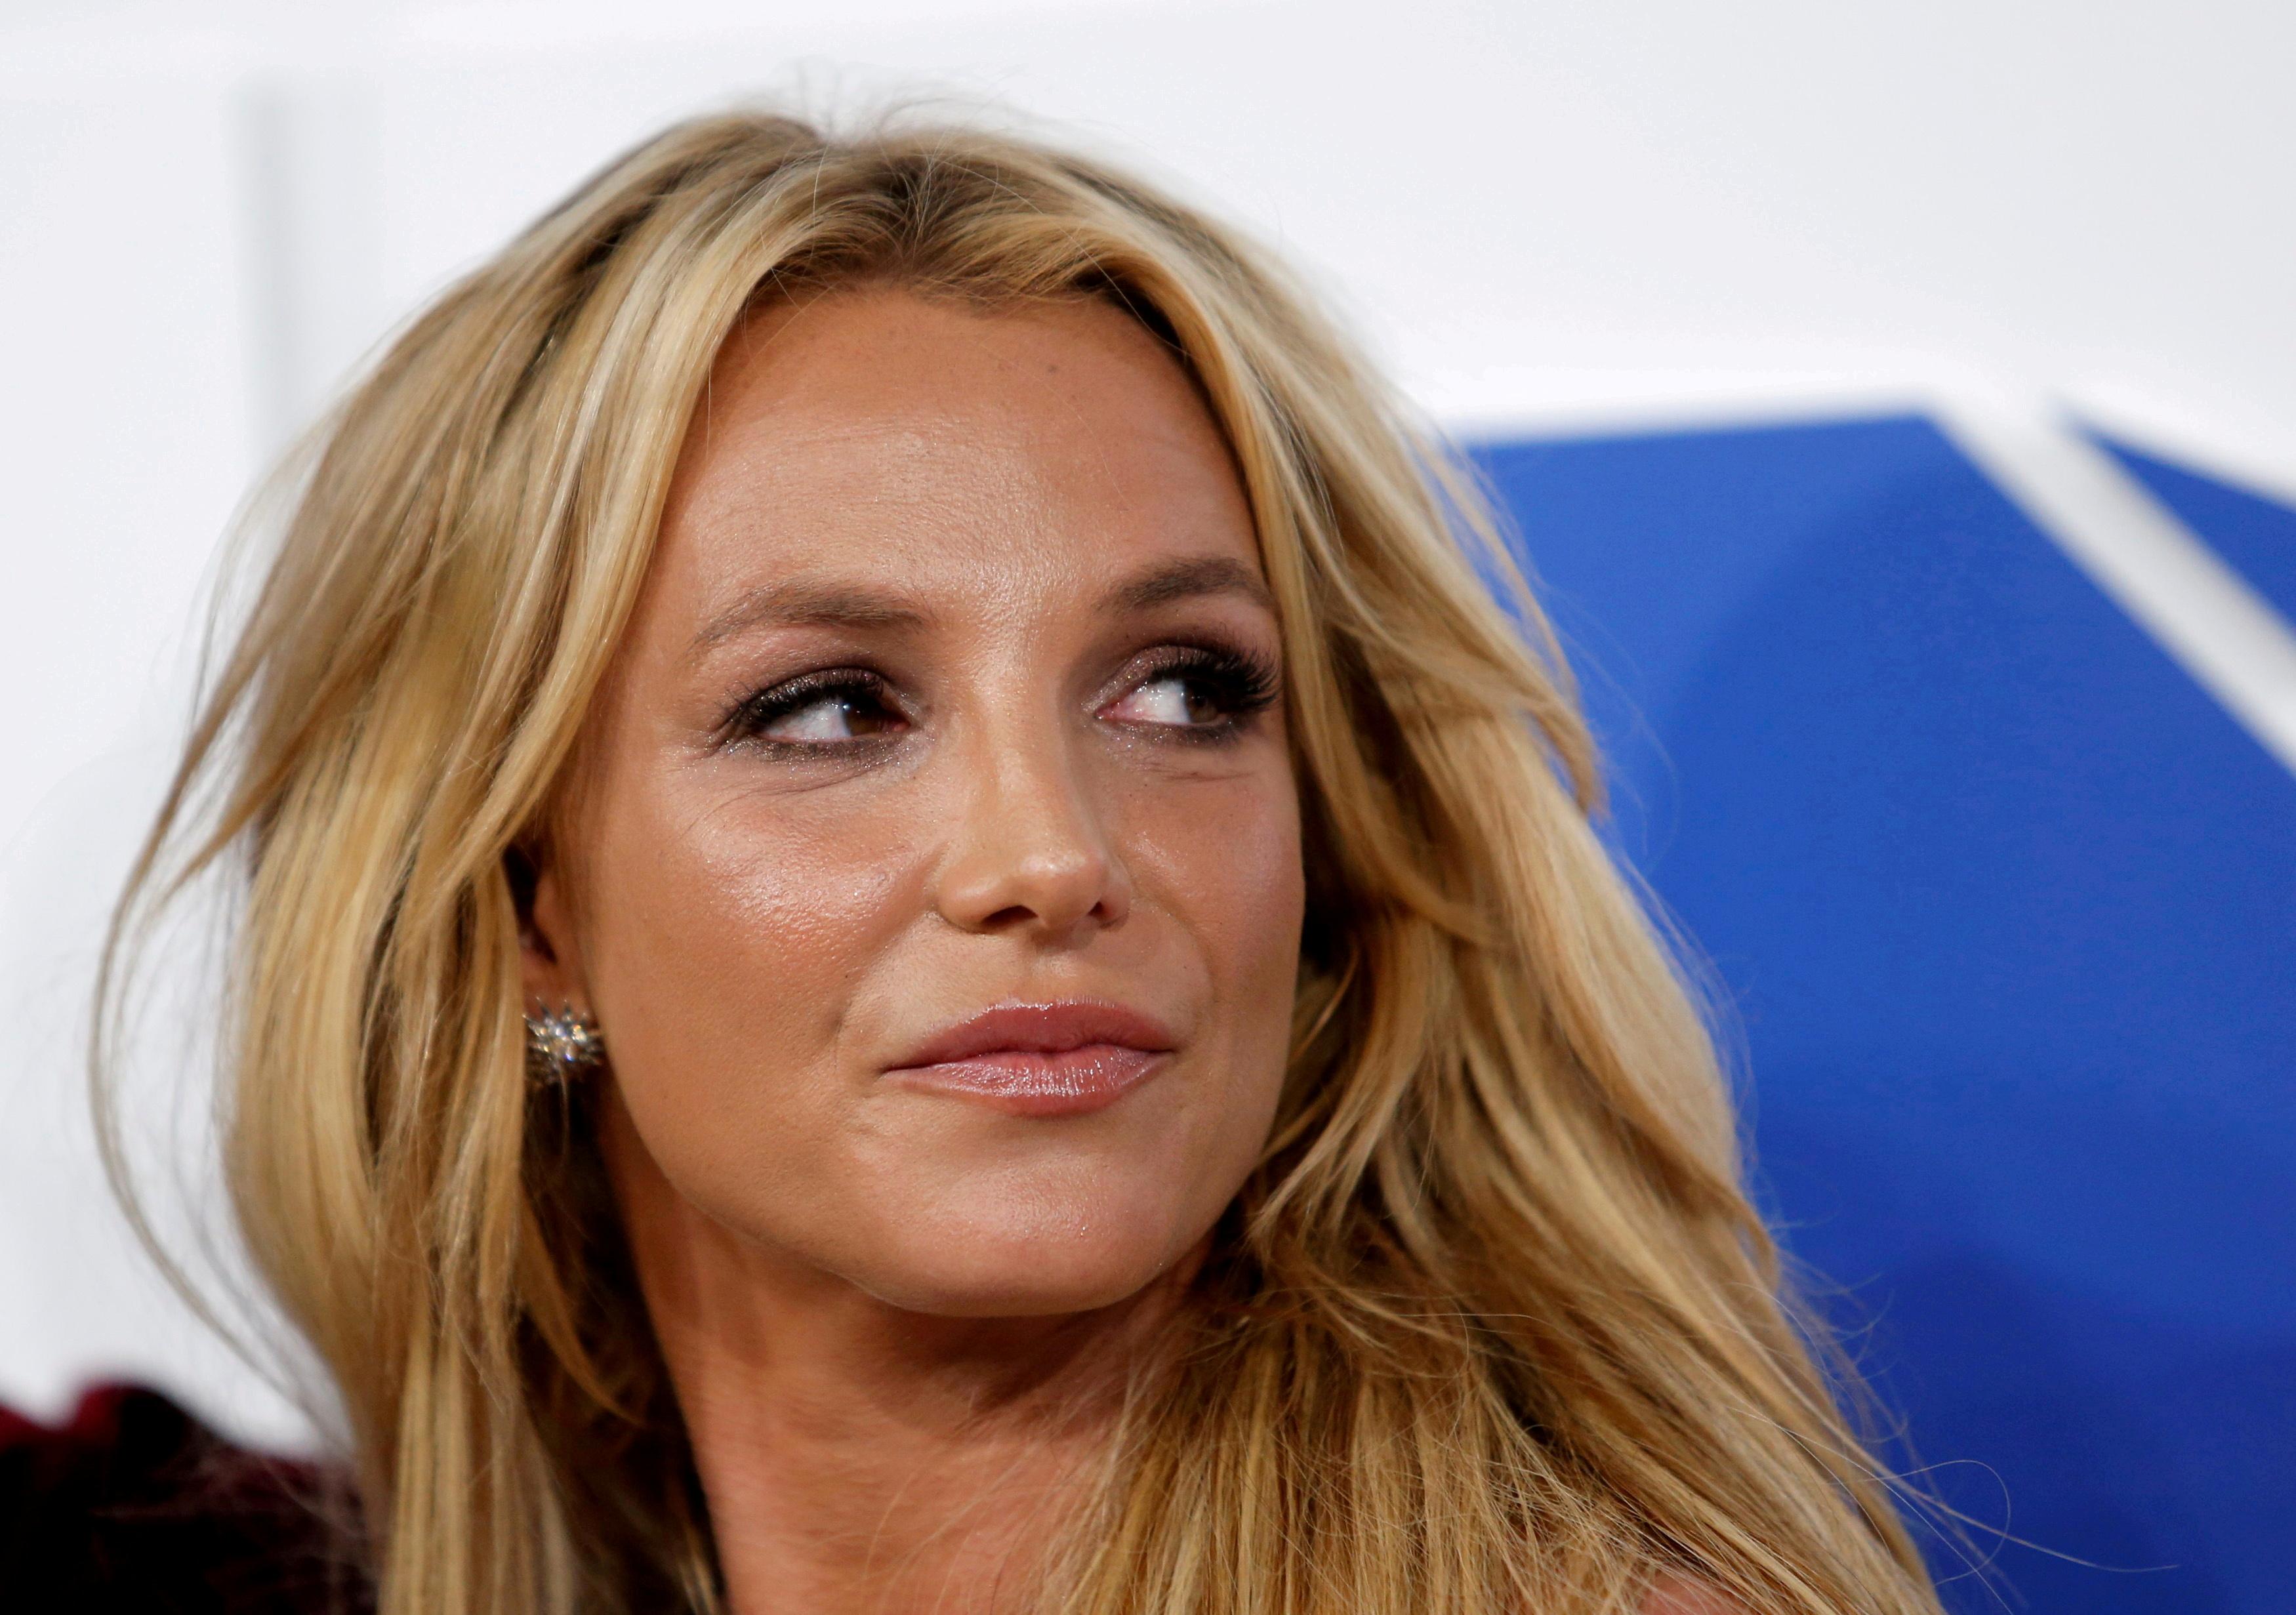 Singer Britney Spears arrives at the 2016 MTV Video Music Awards in New York